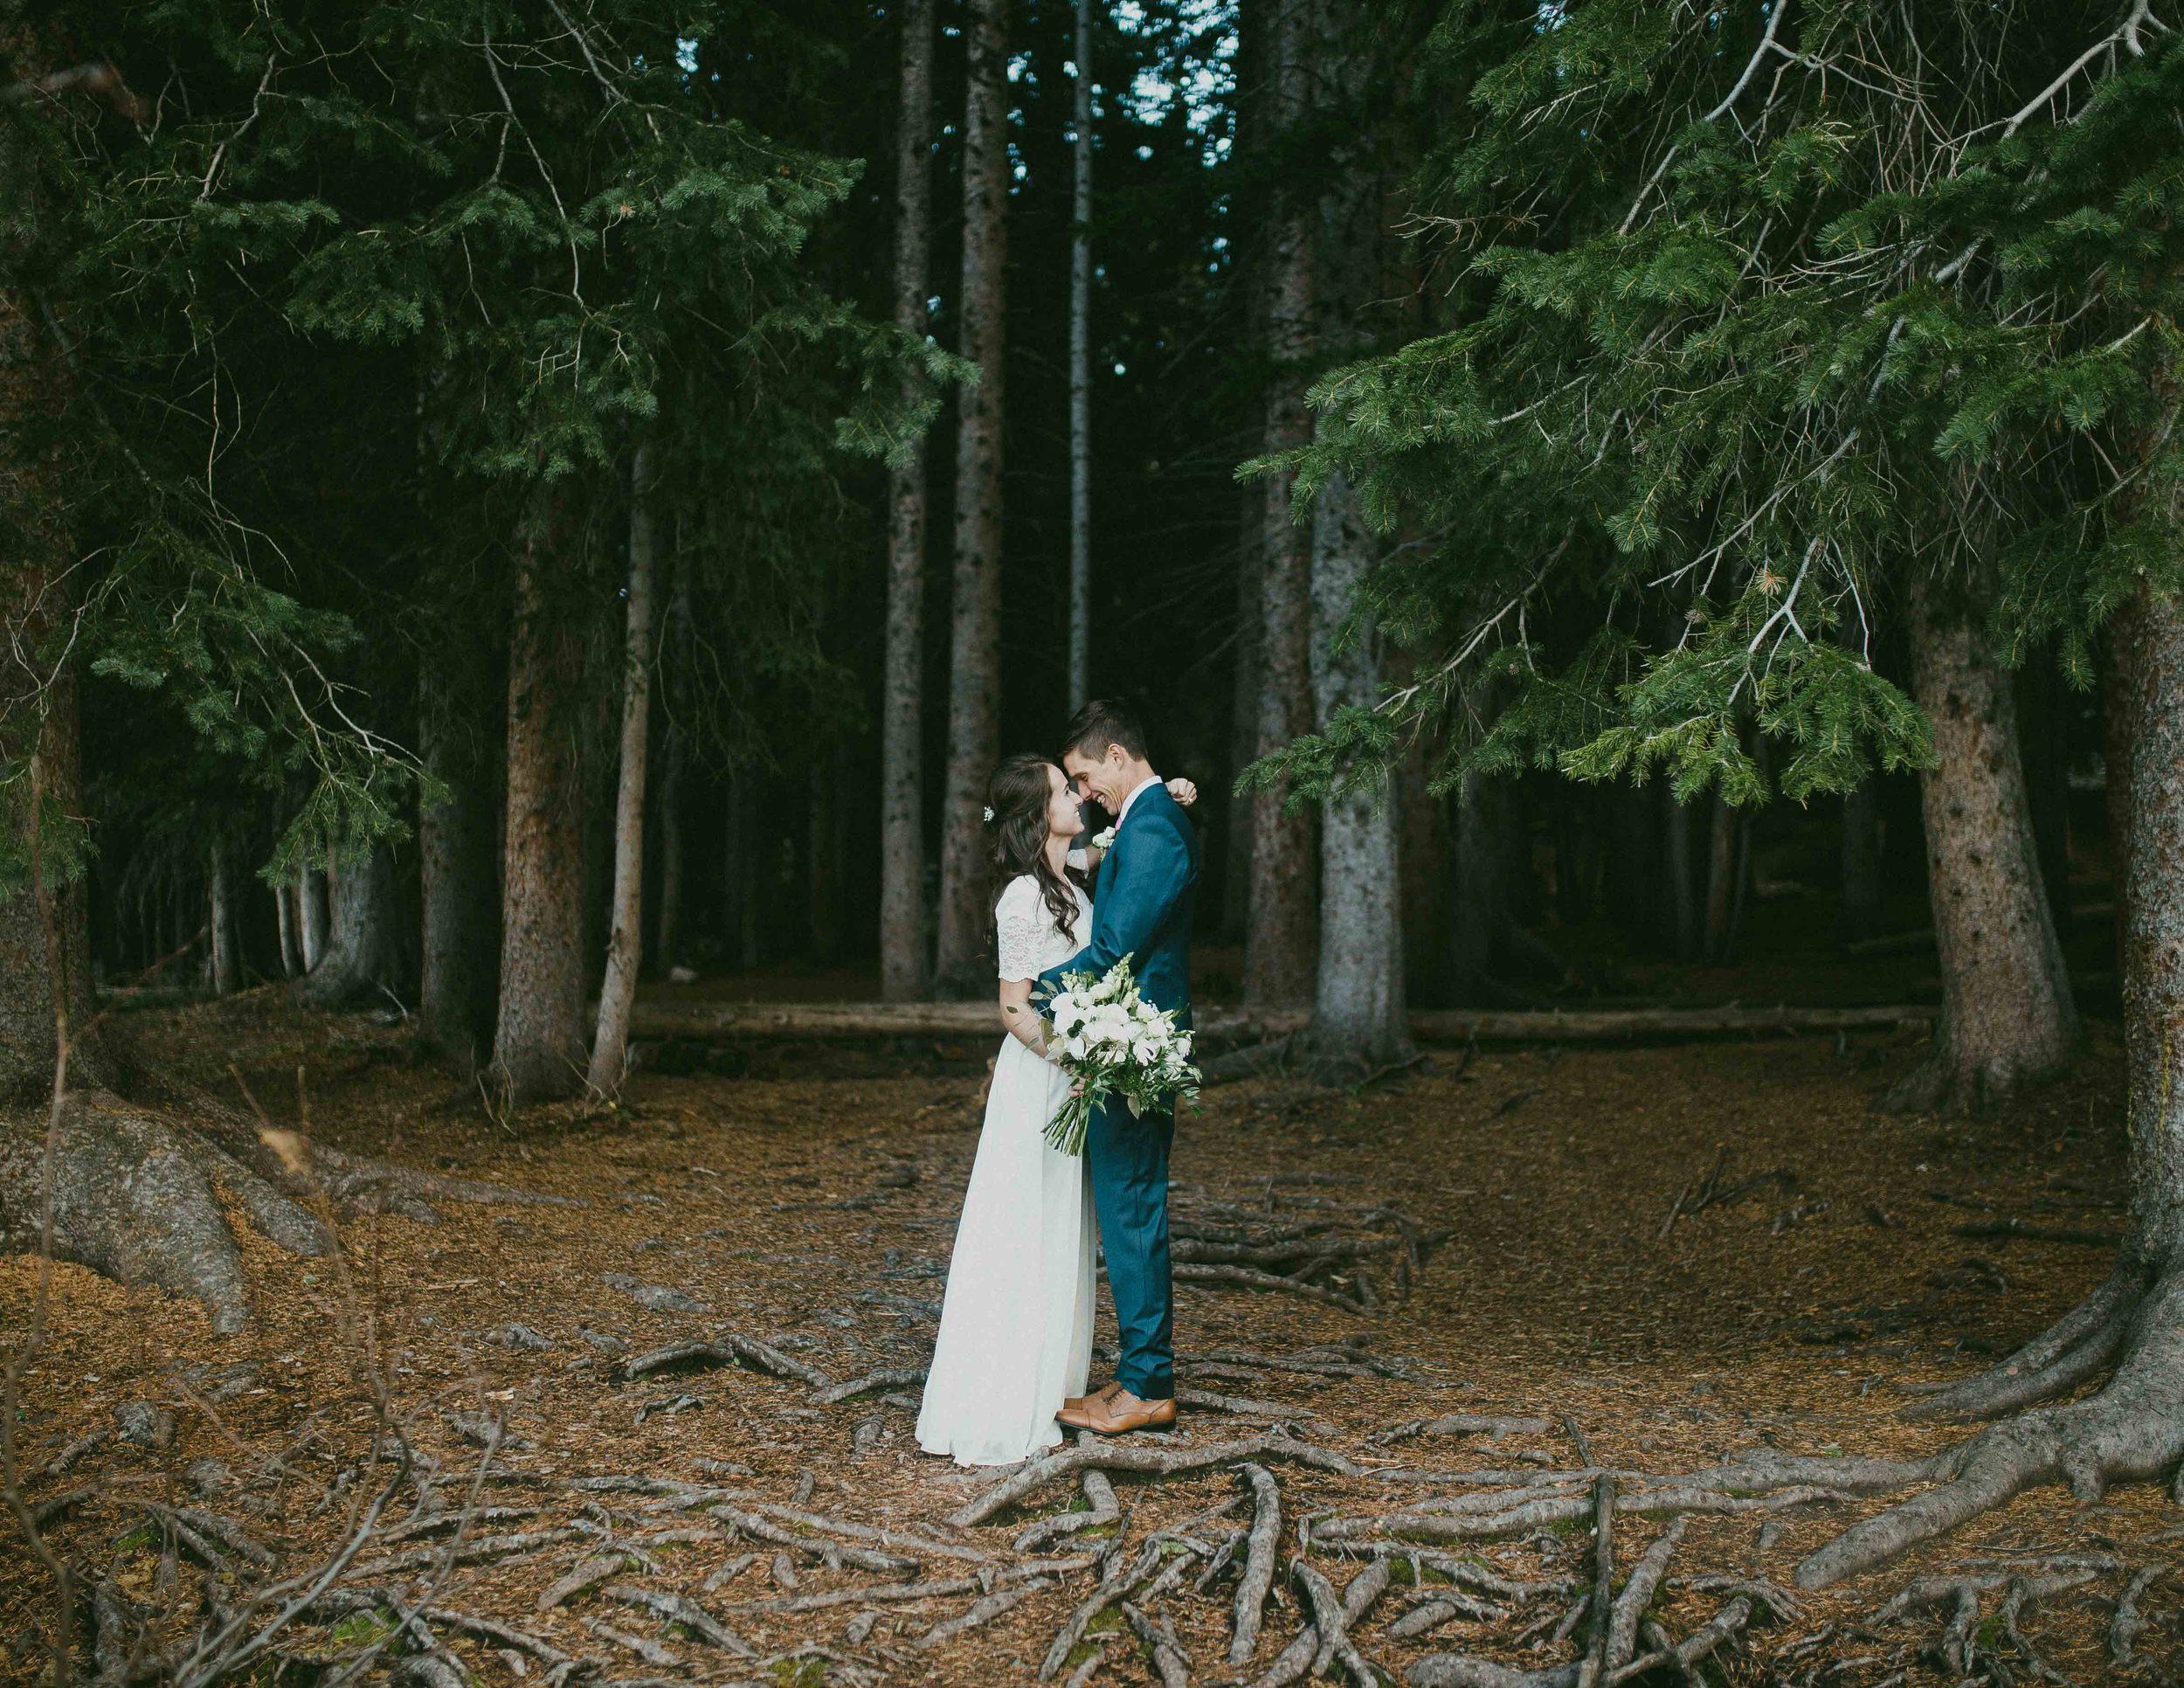 Salt-Lake-City-Wedding-Photographer-1-7.jpg